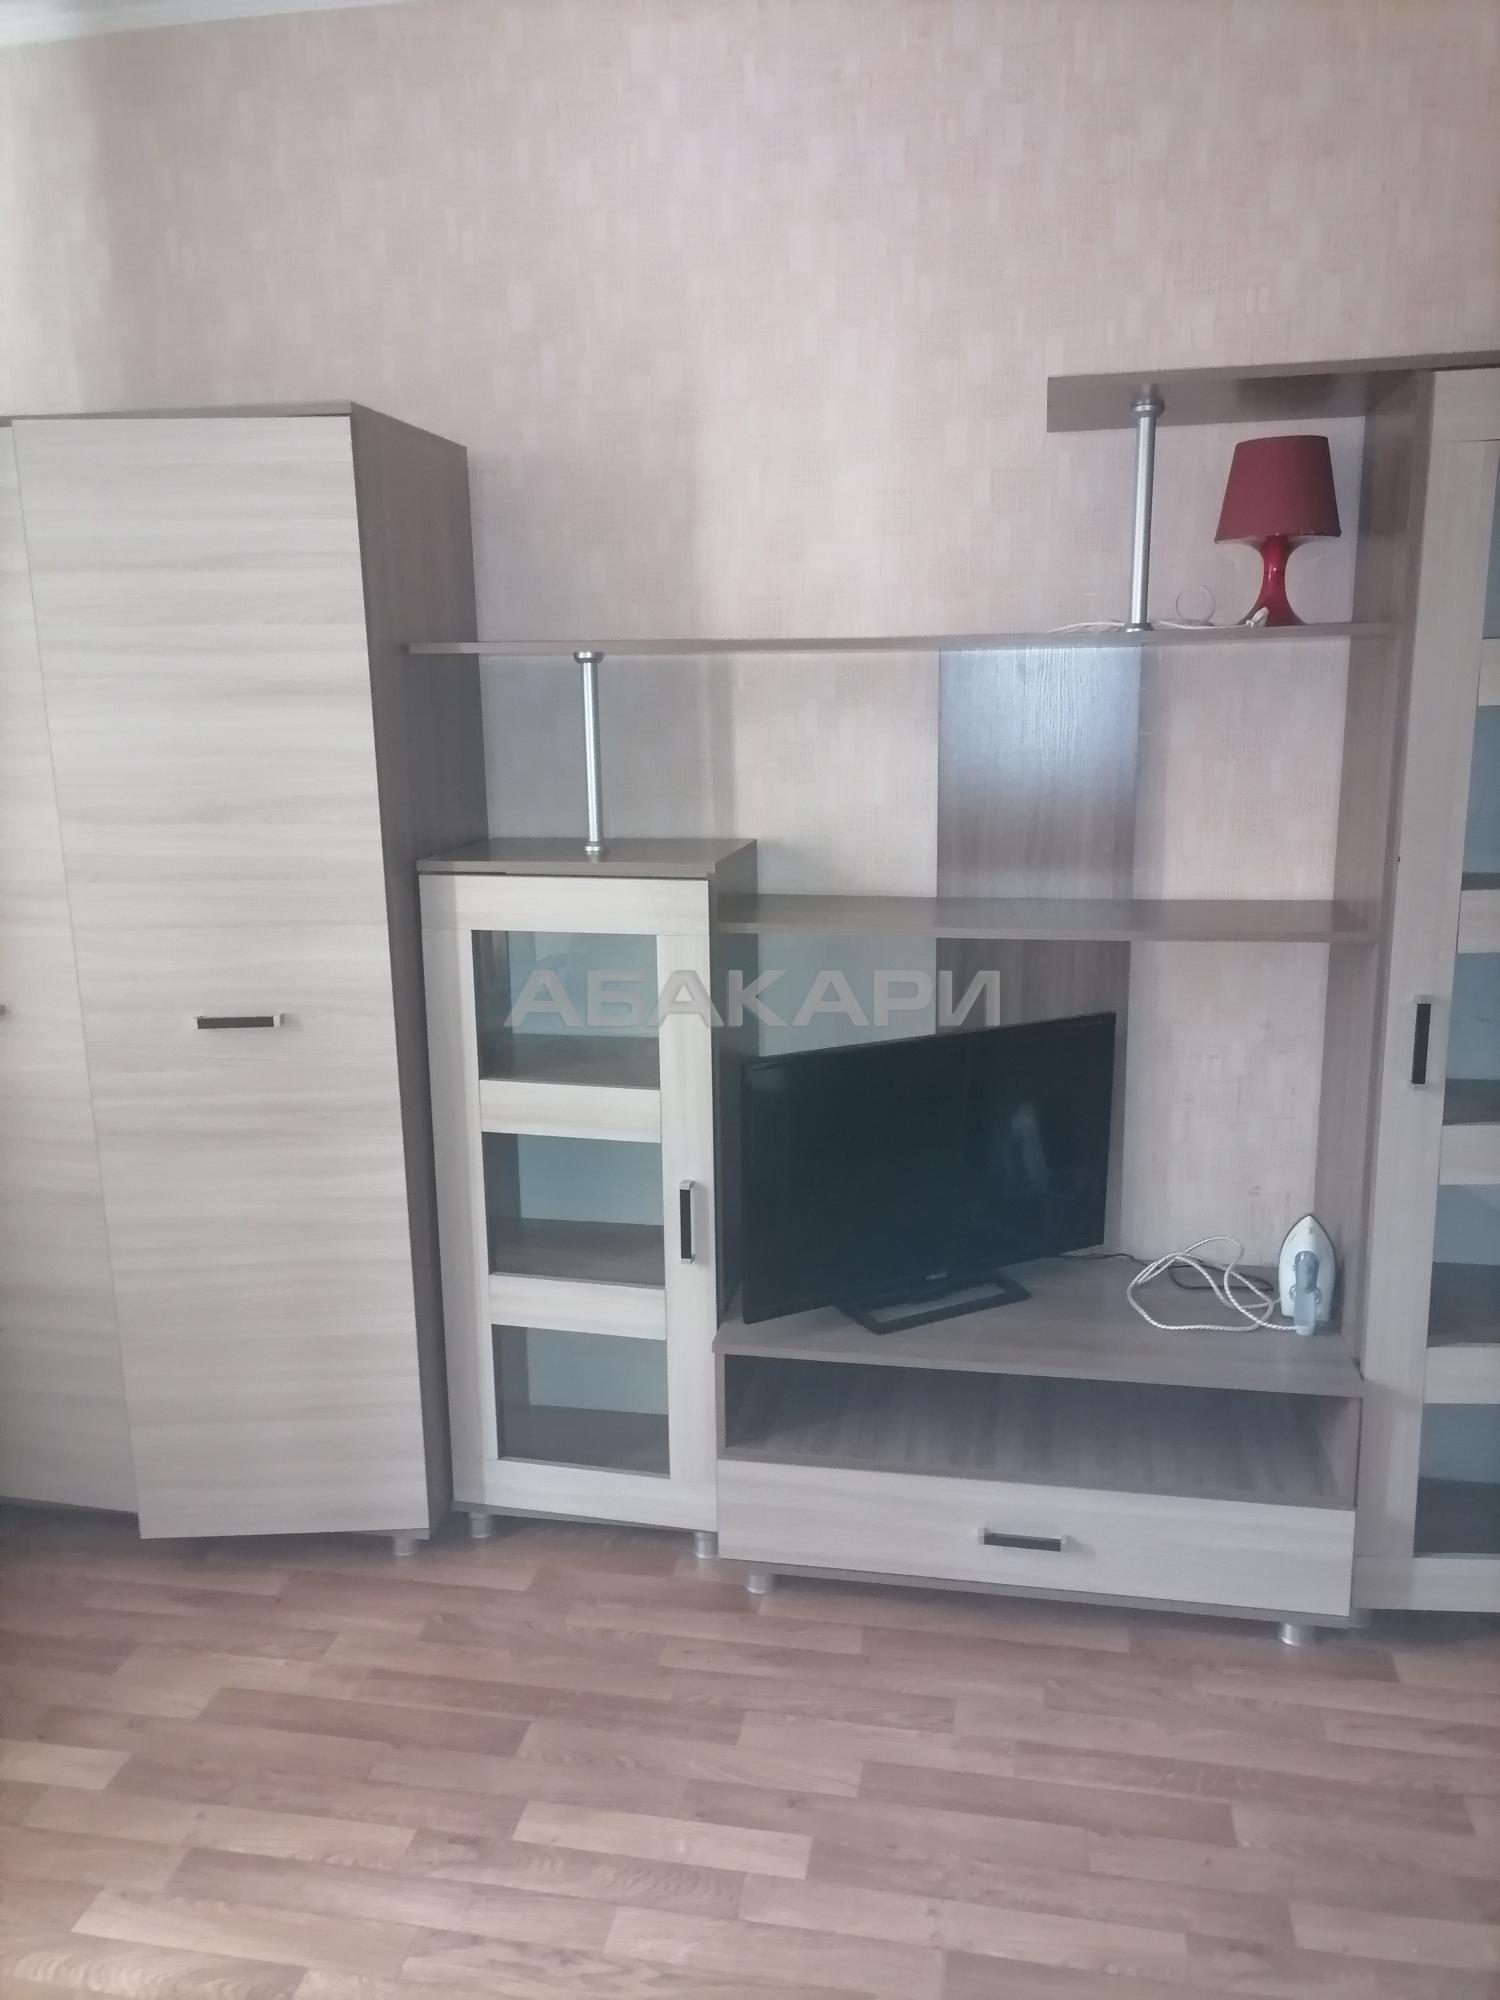 1к квартира Капитанская улица, 10 | 22000 | аренда в Красноярске фото 0